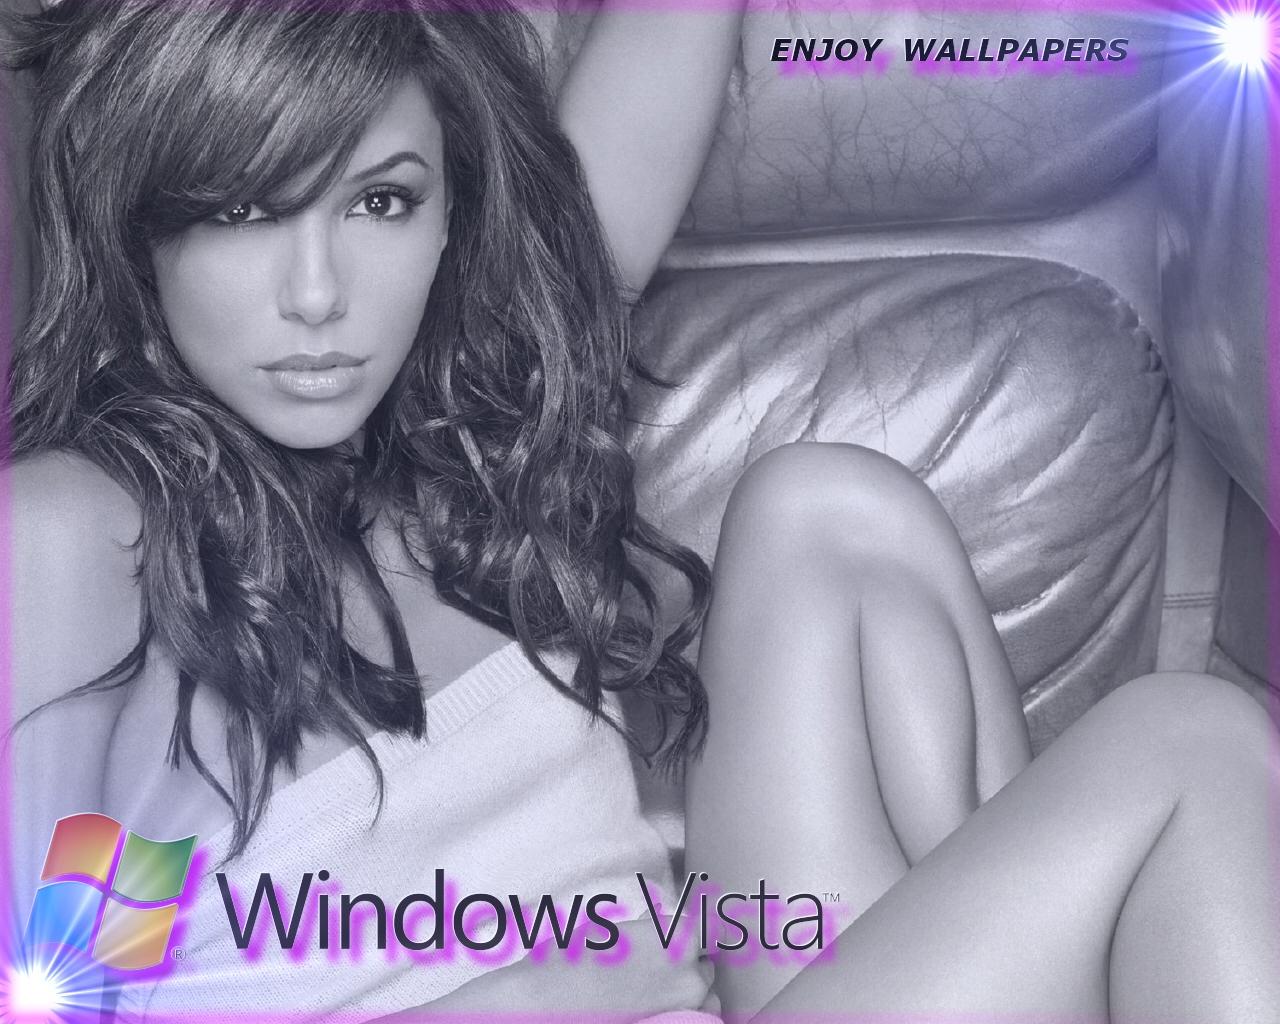 http://2.bp.blogspot.com/-0v-7X7l_T1Y/TiJzXauGkaI/AAAAAAAAAL8/QYzJUjL-hjo/s1600/eva_longoria+wallpaper+vista+by+enjoy+wallpapers.jpg